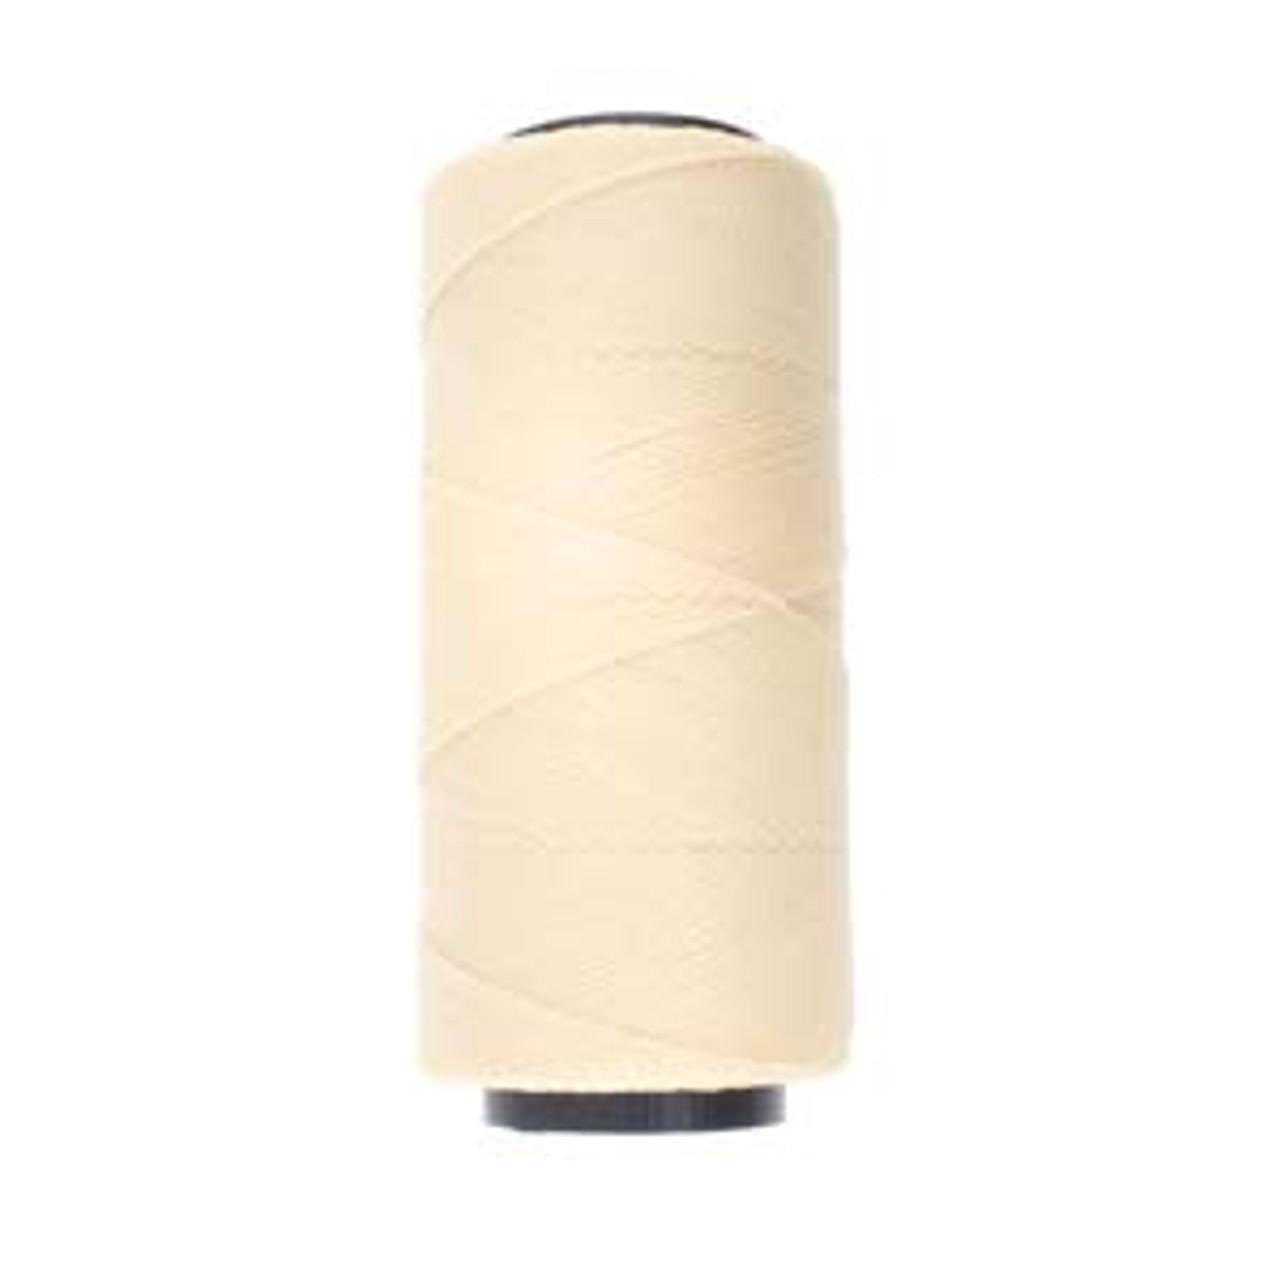 144yds 2 ply Cream Waxed Brazilian Cord